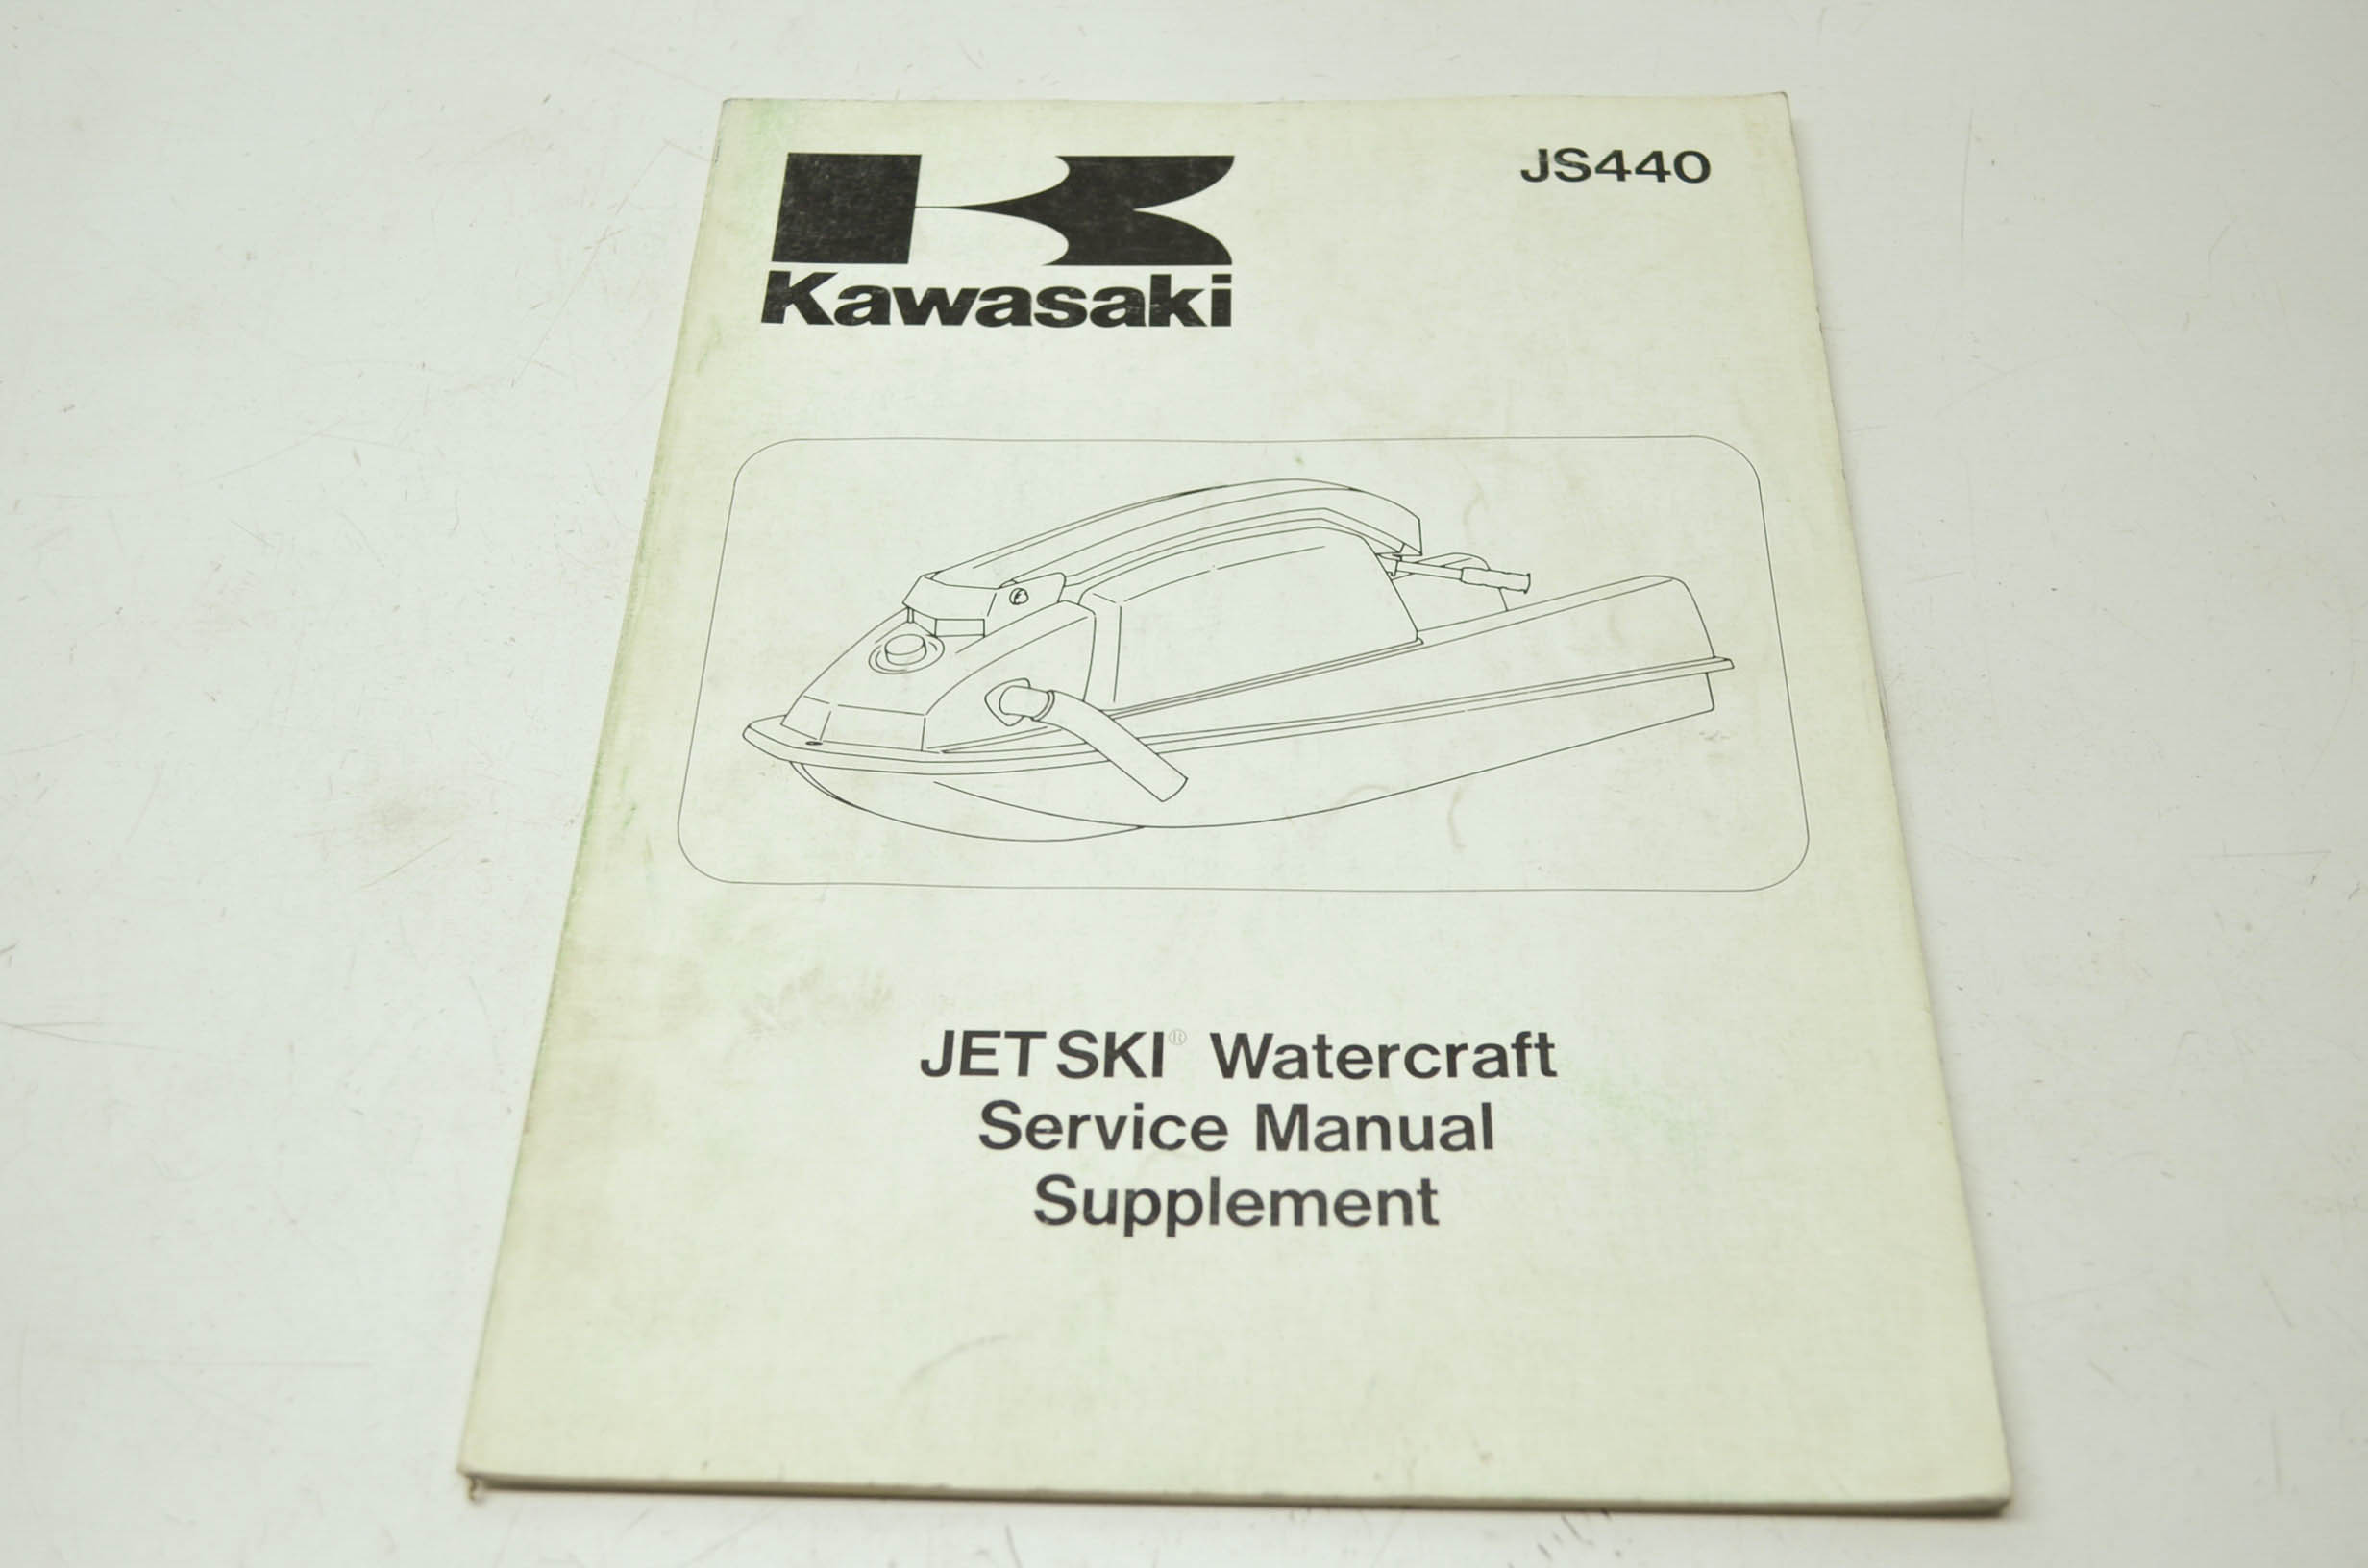 kawasaki 99924 1091 51 js440 jet ski service manual supplement qty 1 superior broom wiring diagrams [ 2464 x 1632 Pixel ]